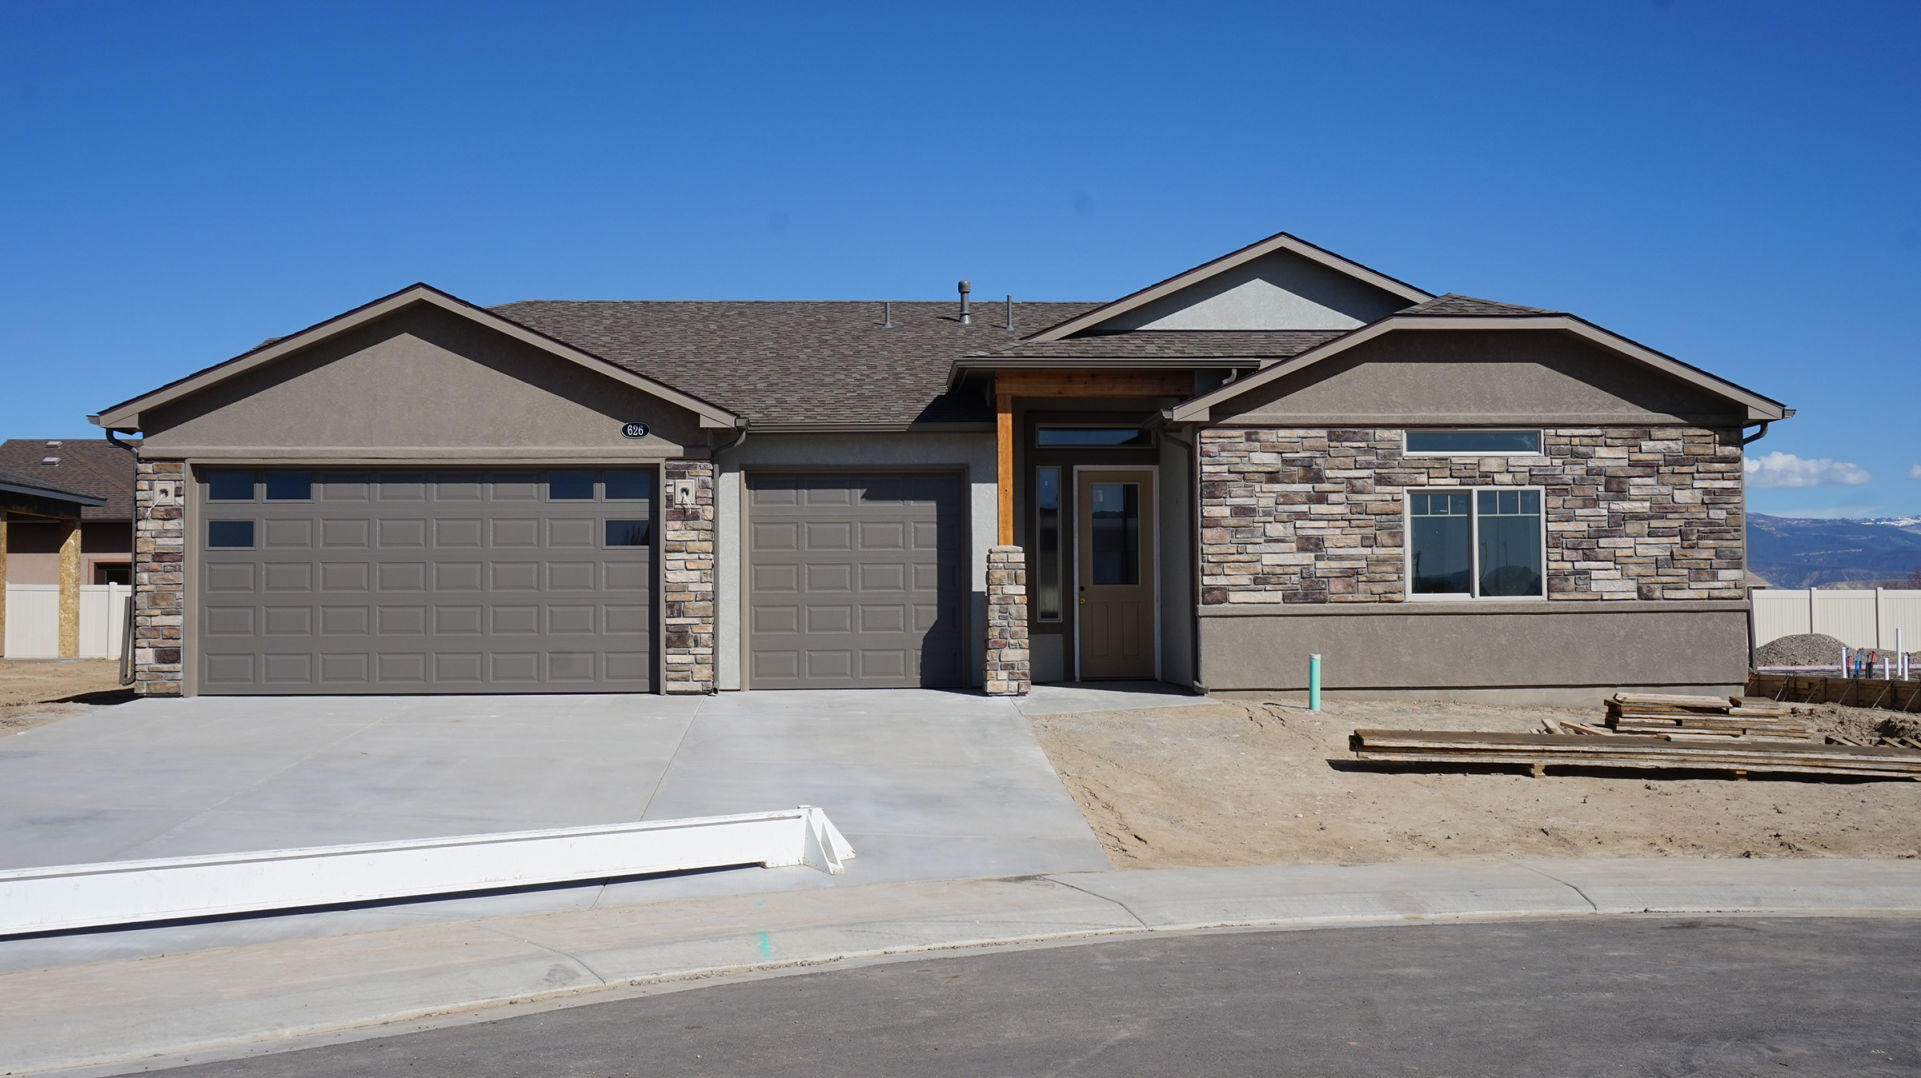 Good New Neighborhood In Northeast Offers Nice Homes, Good Values